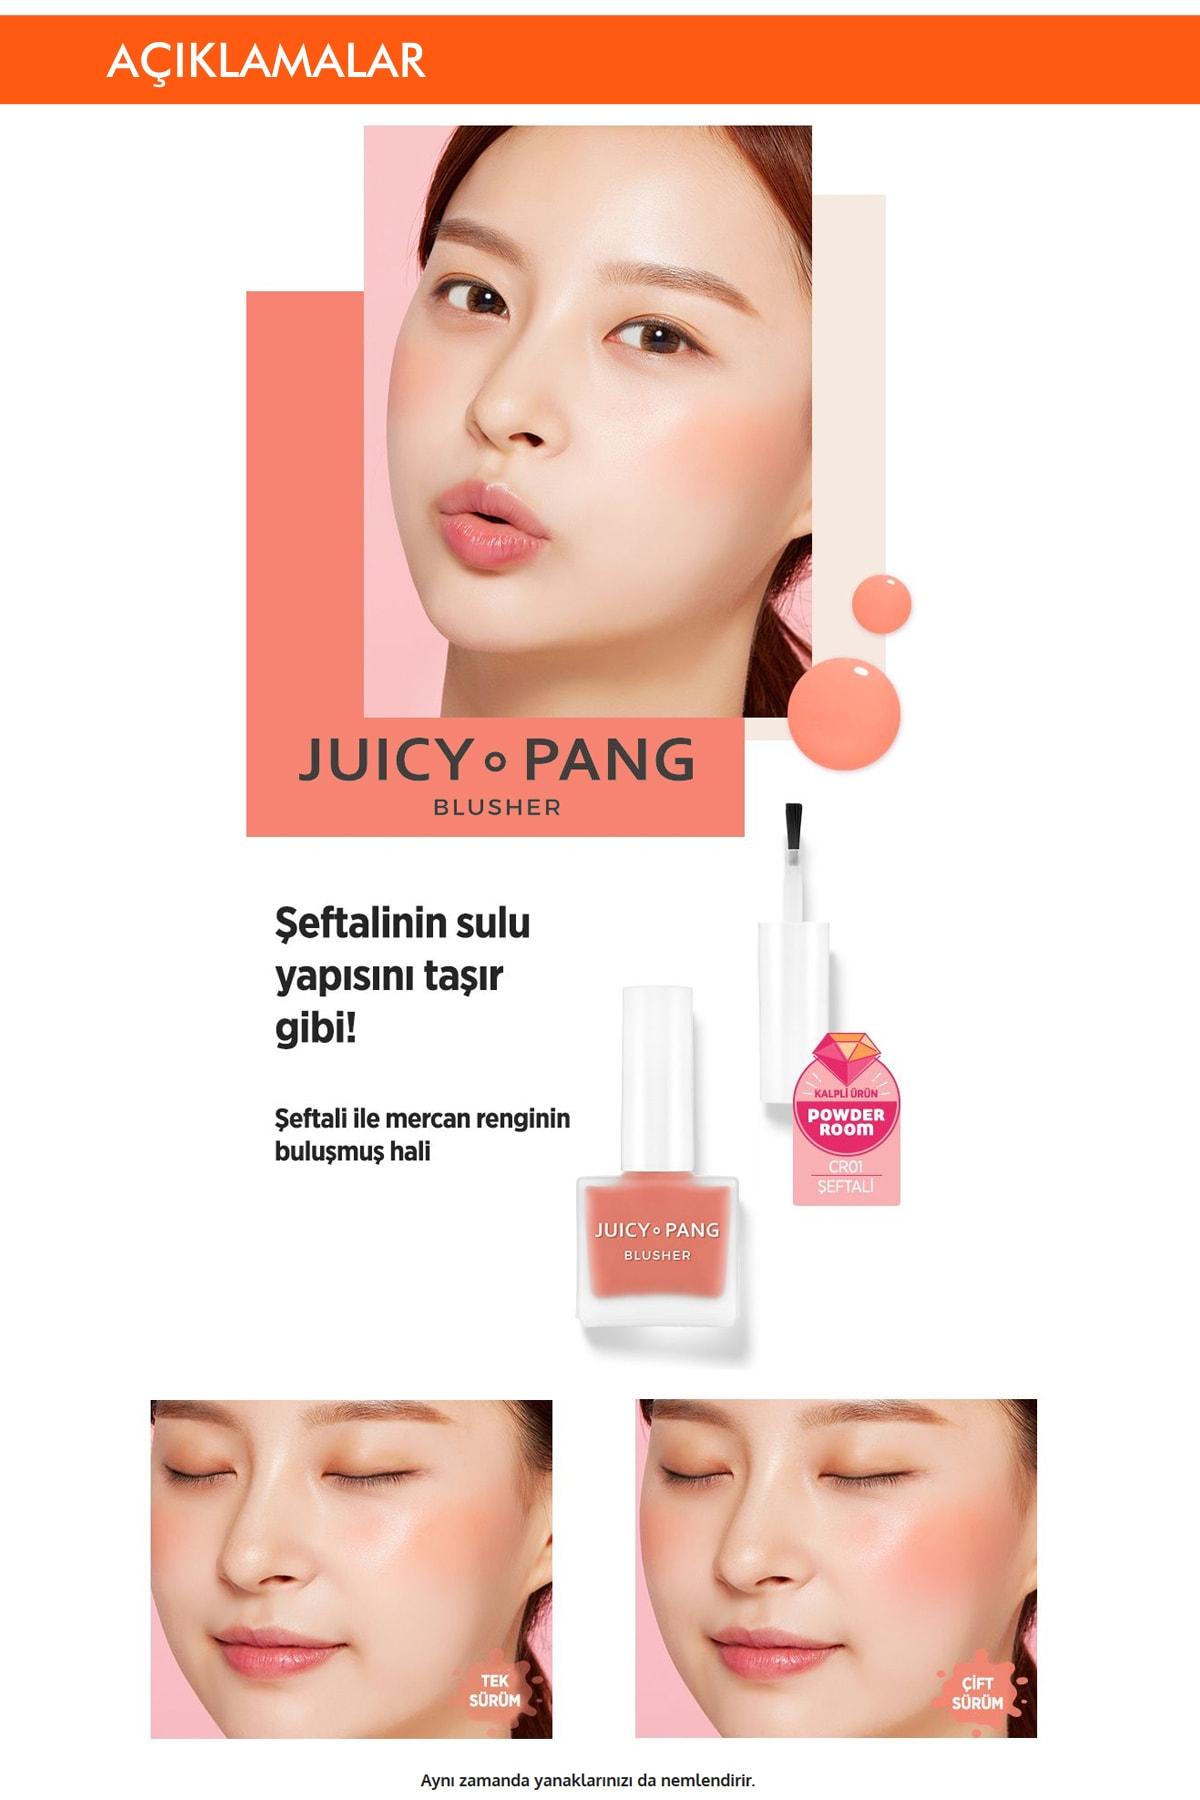 Missha Doğal Görünüm Sunan Nemlendirici Likit Allık 9g. APIEU Juicy-Pang Water Blusher (CR01) 2